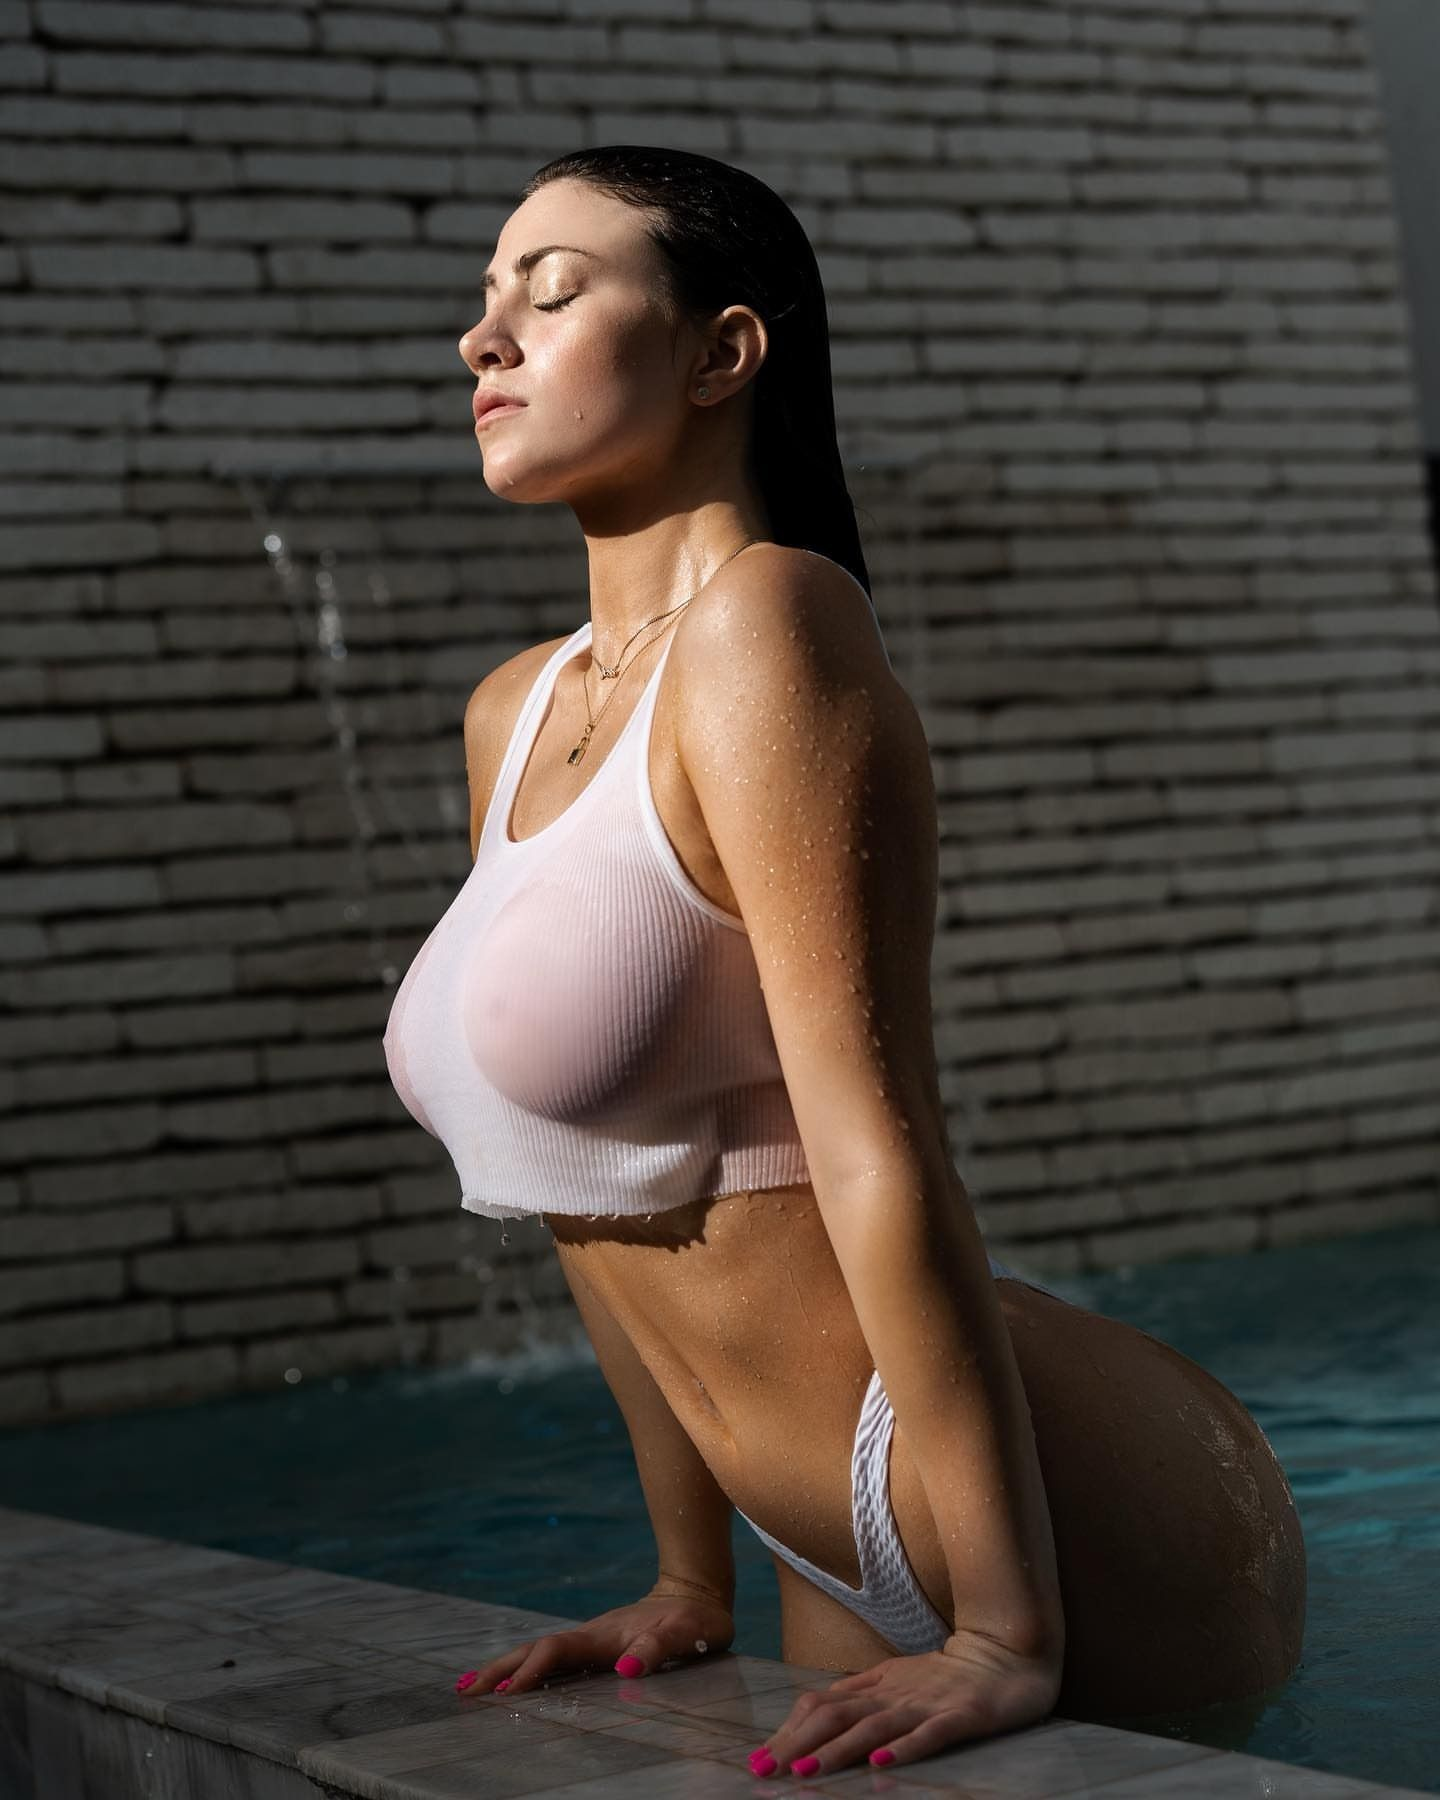 und bikini Lustig